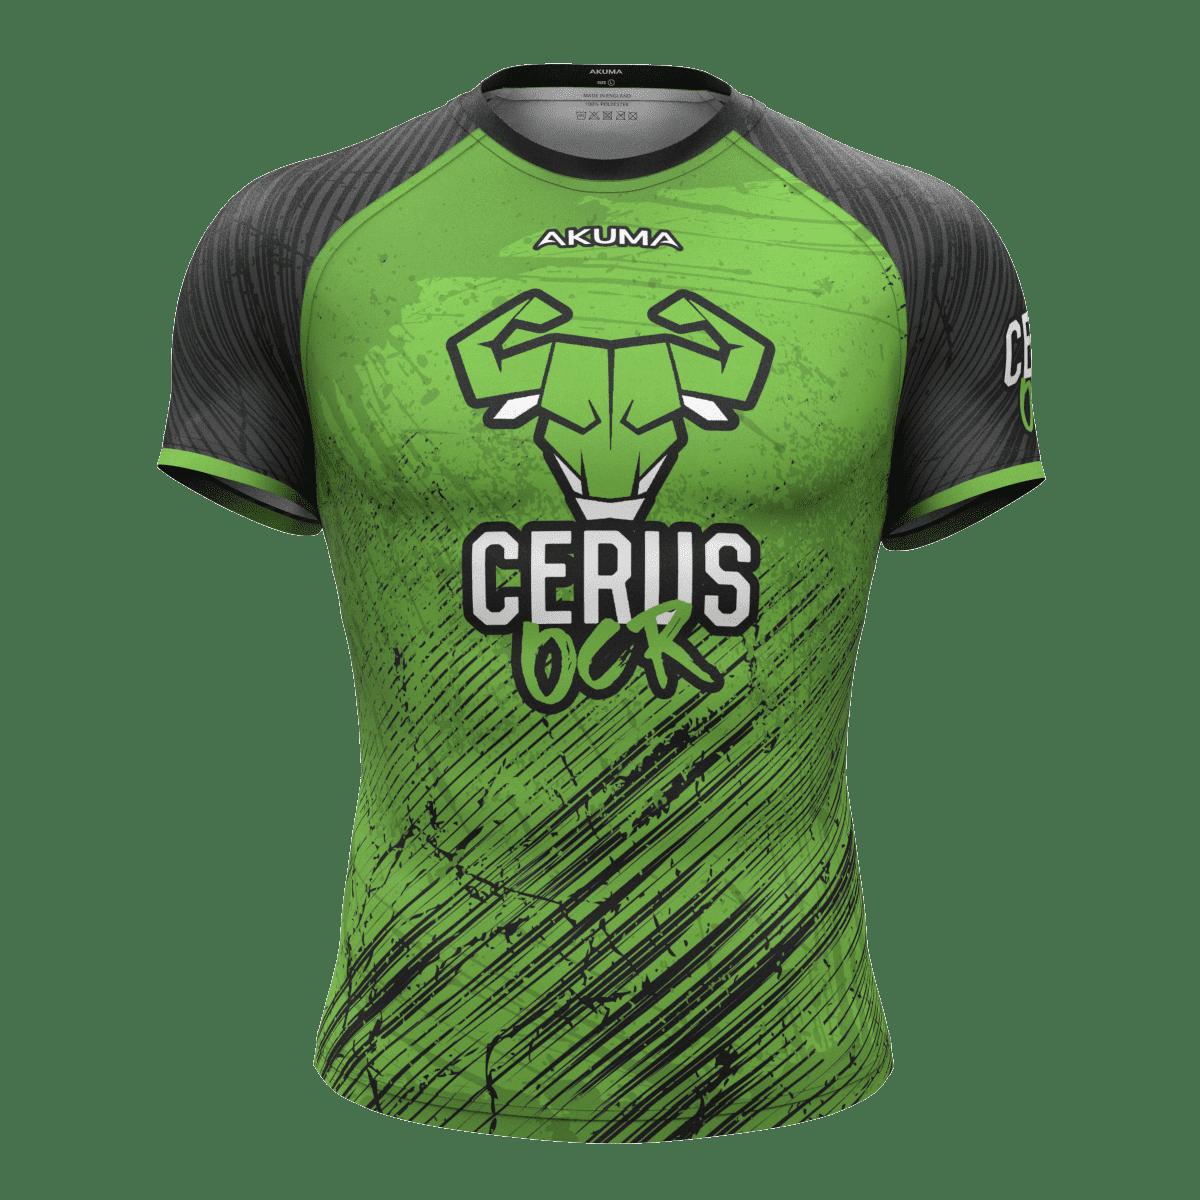 Cerus Men's Fortitude Jersey by Akuma